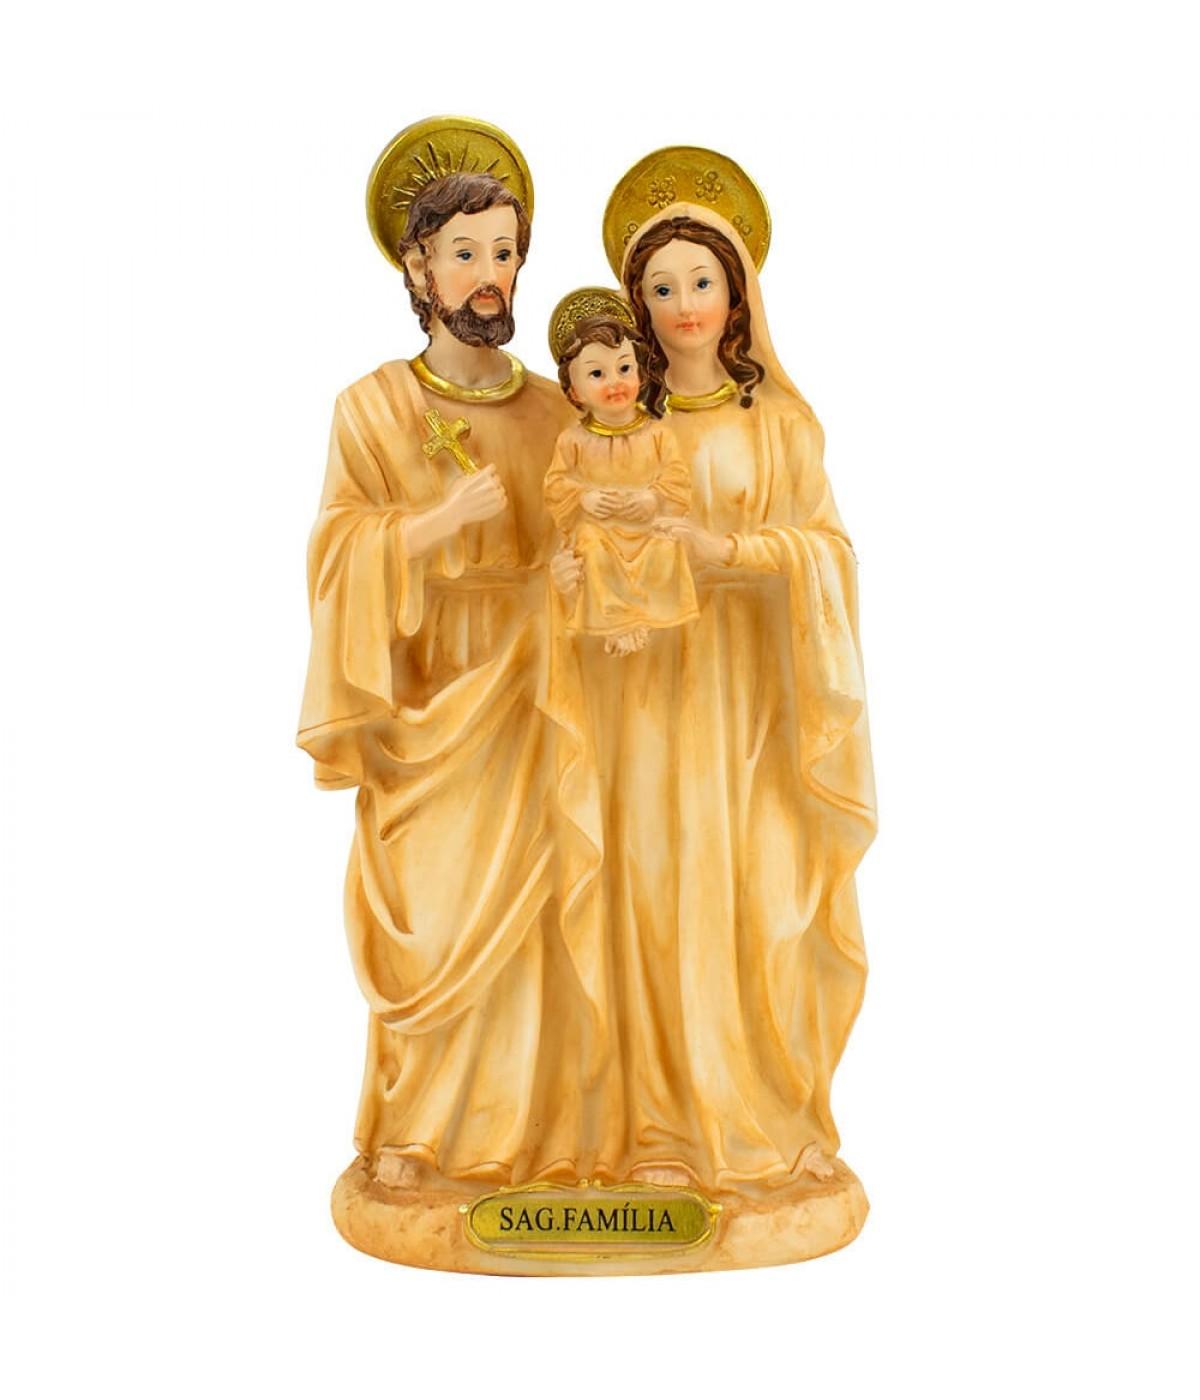 Sagrada Família 20cm - Enfeite Resina